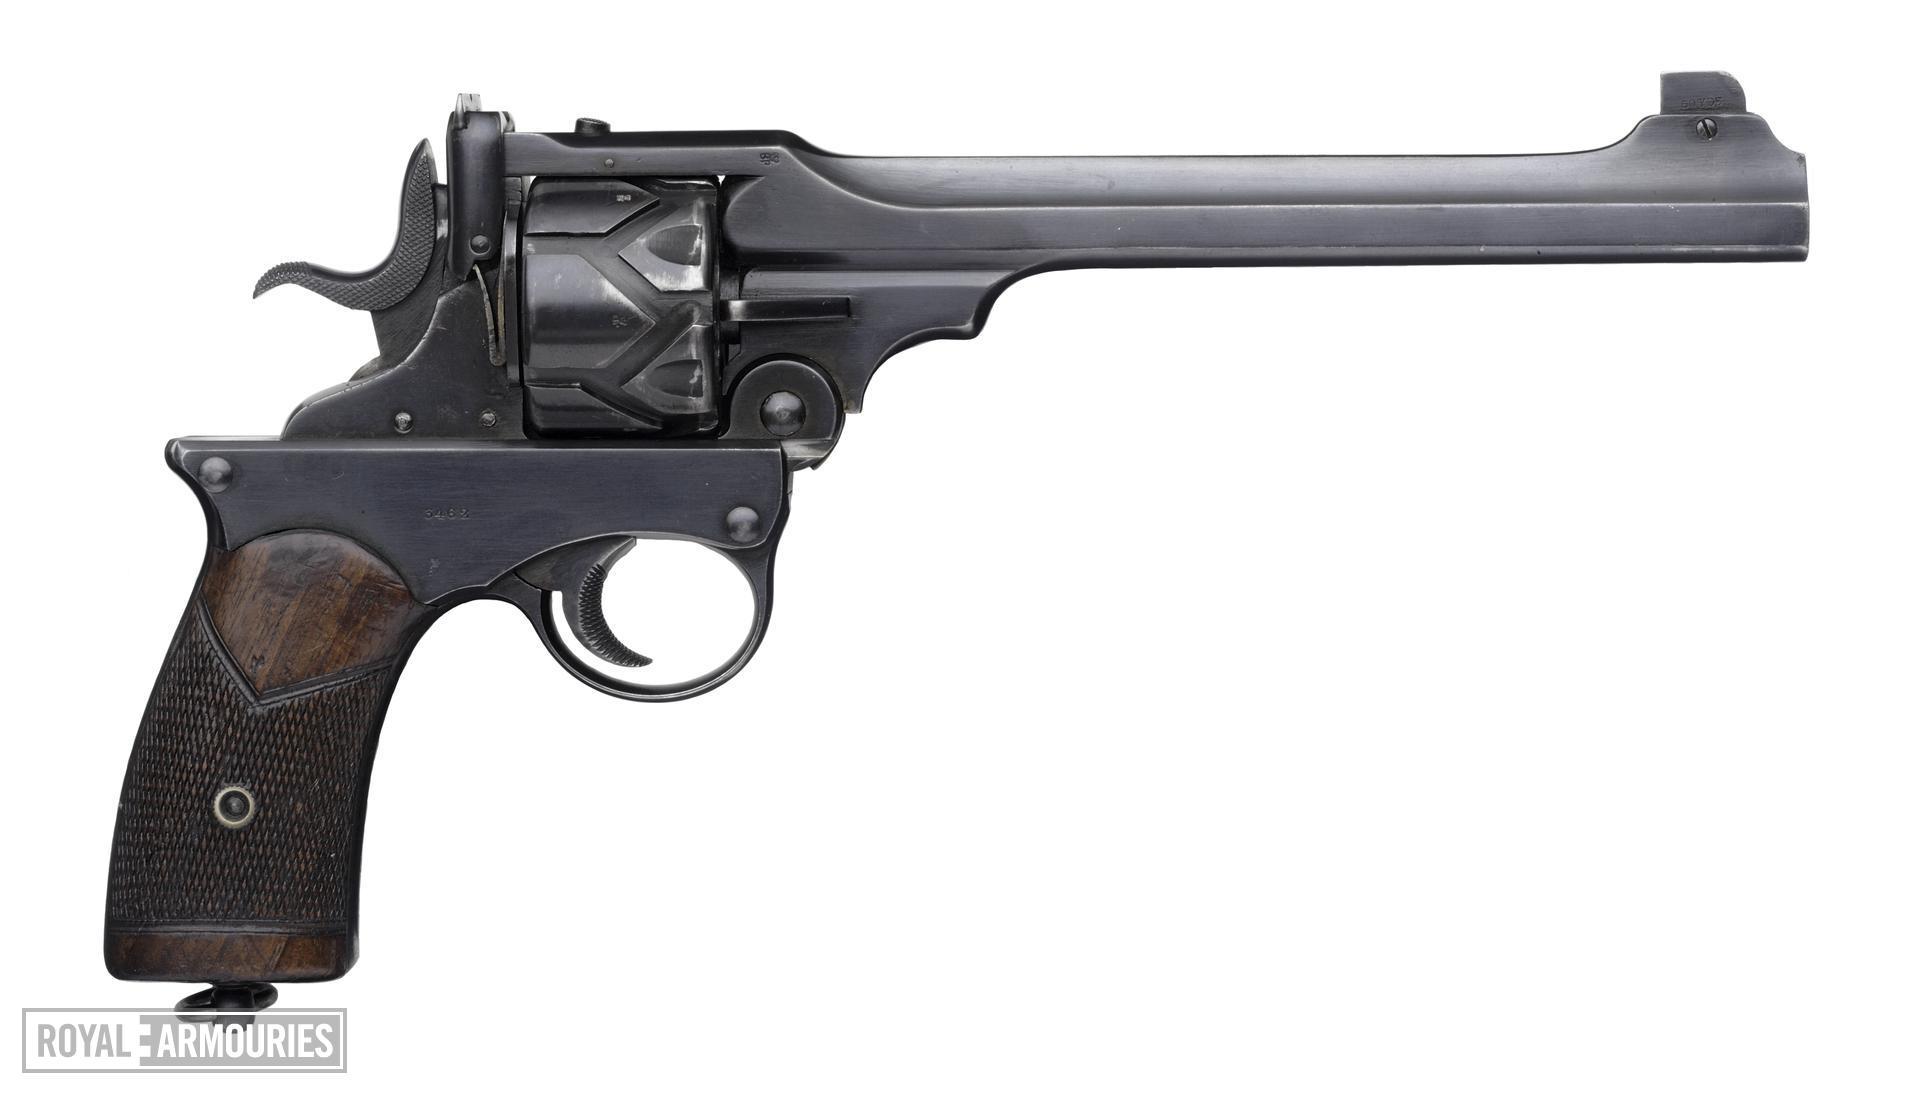 Centrefire six-shot self-cocking target revolver - Webley Fosbery Target Model Target model.